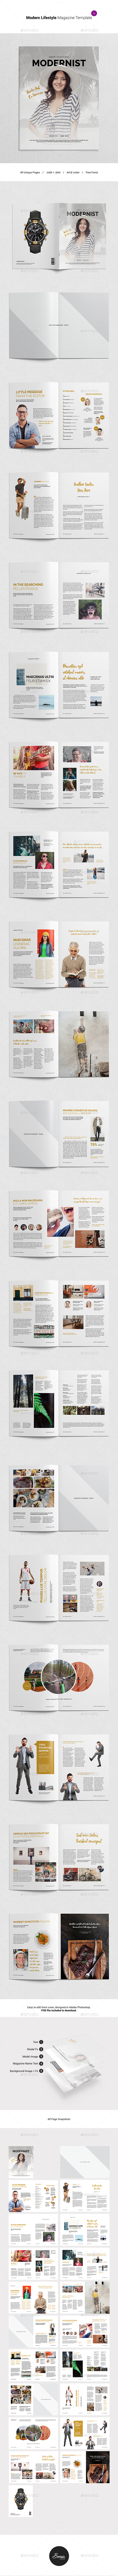 Modern Lifestyle Magazine Template - Magazines Print Templates